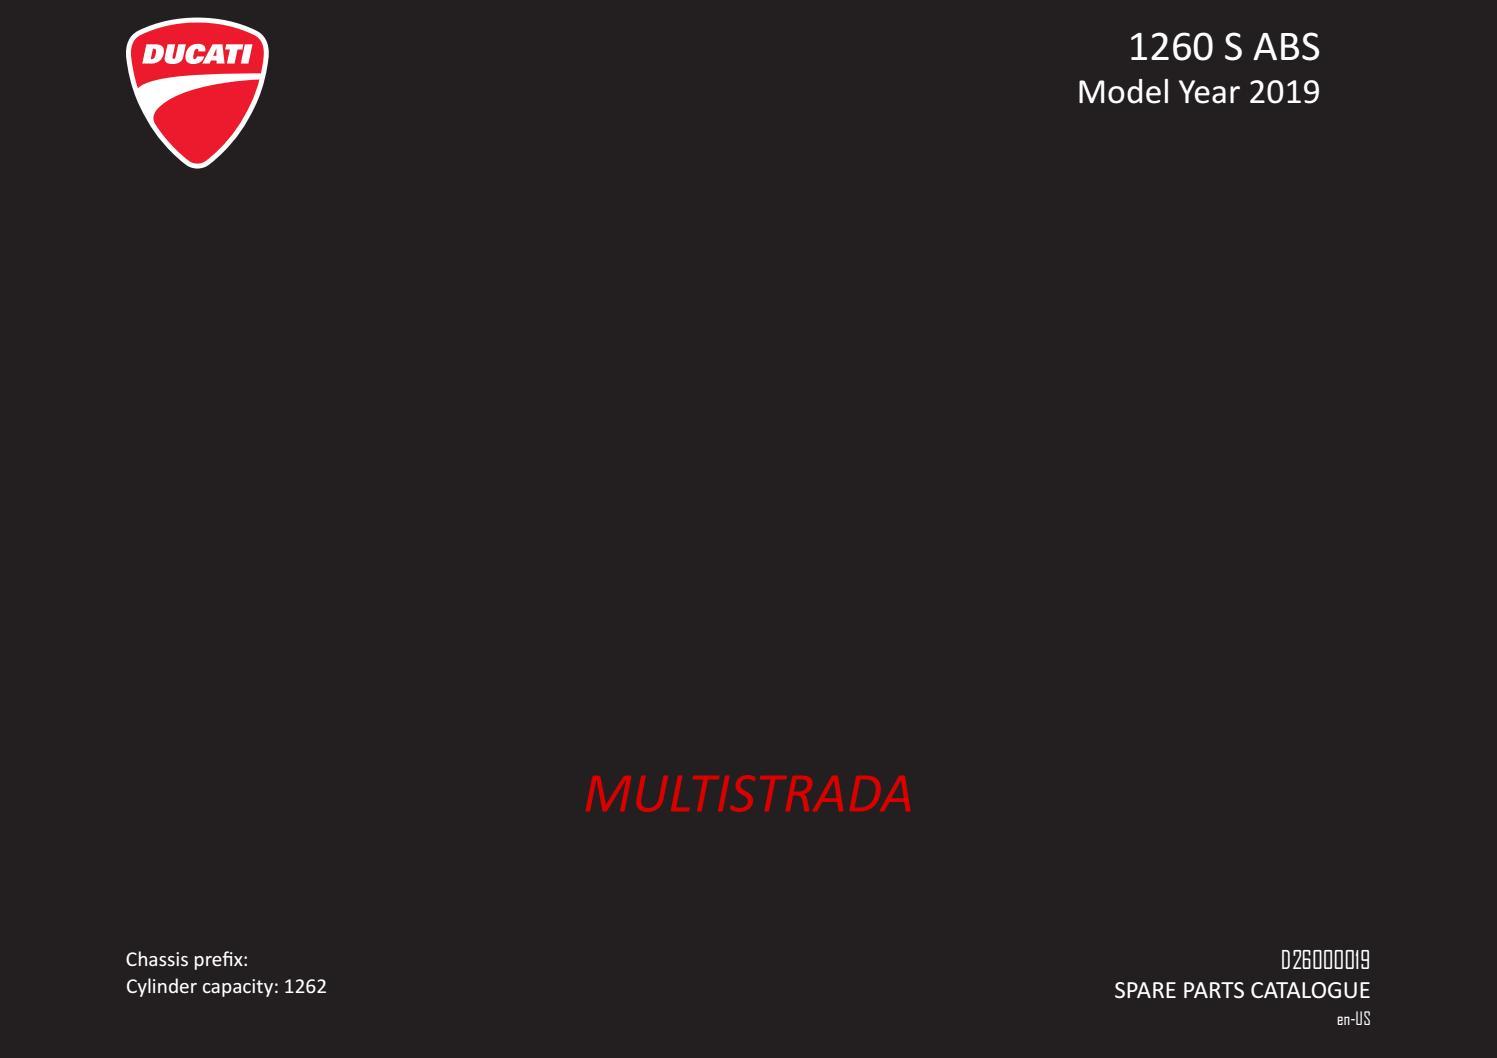 2019 Ducati Multistrada 1260 S Parts Diagram Ducati Omaha by